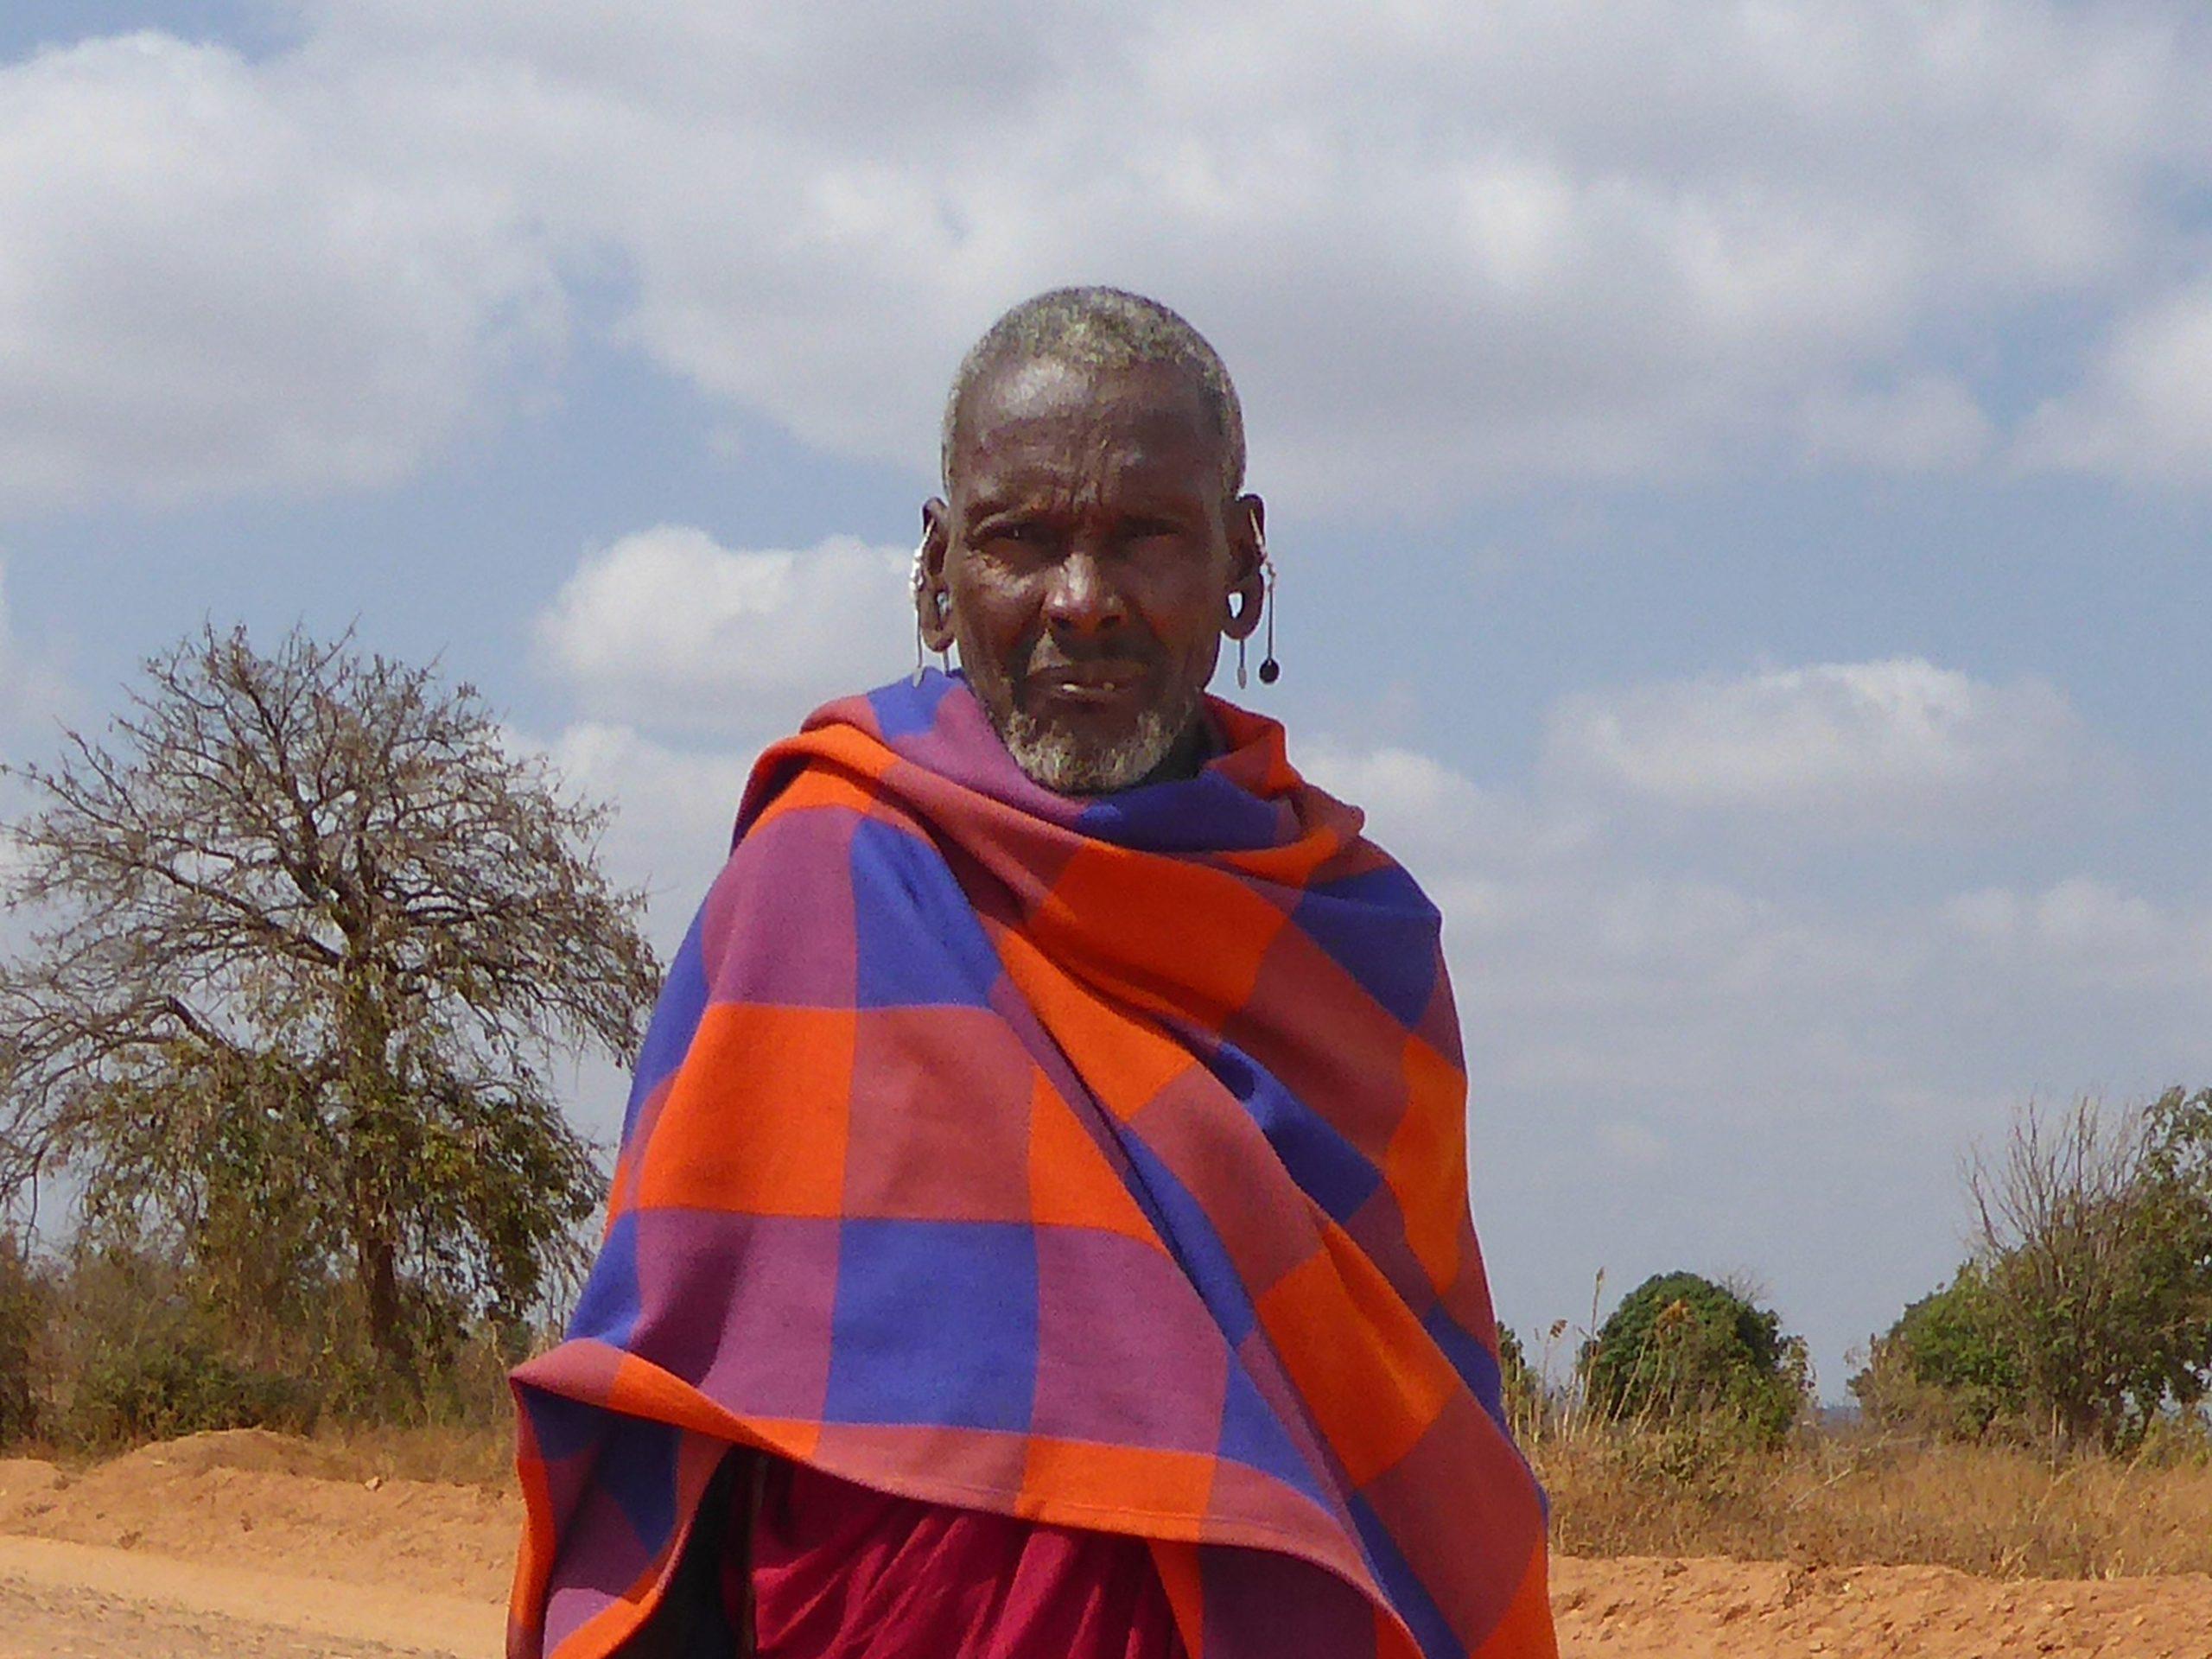 Radreise Afrika 2014 - Massai